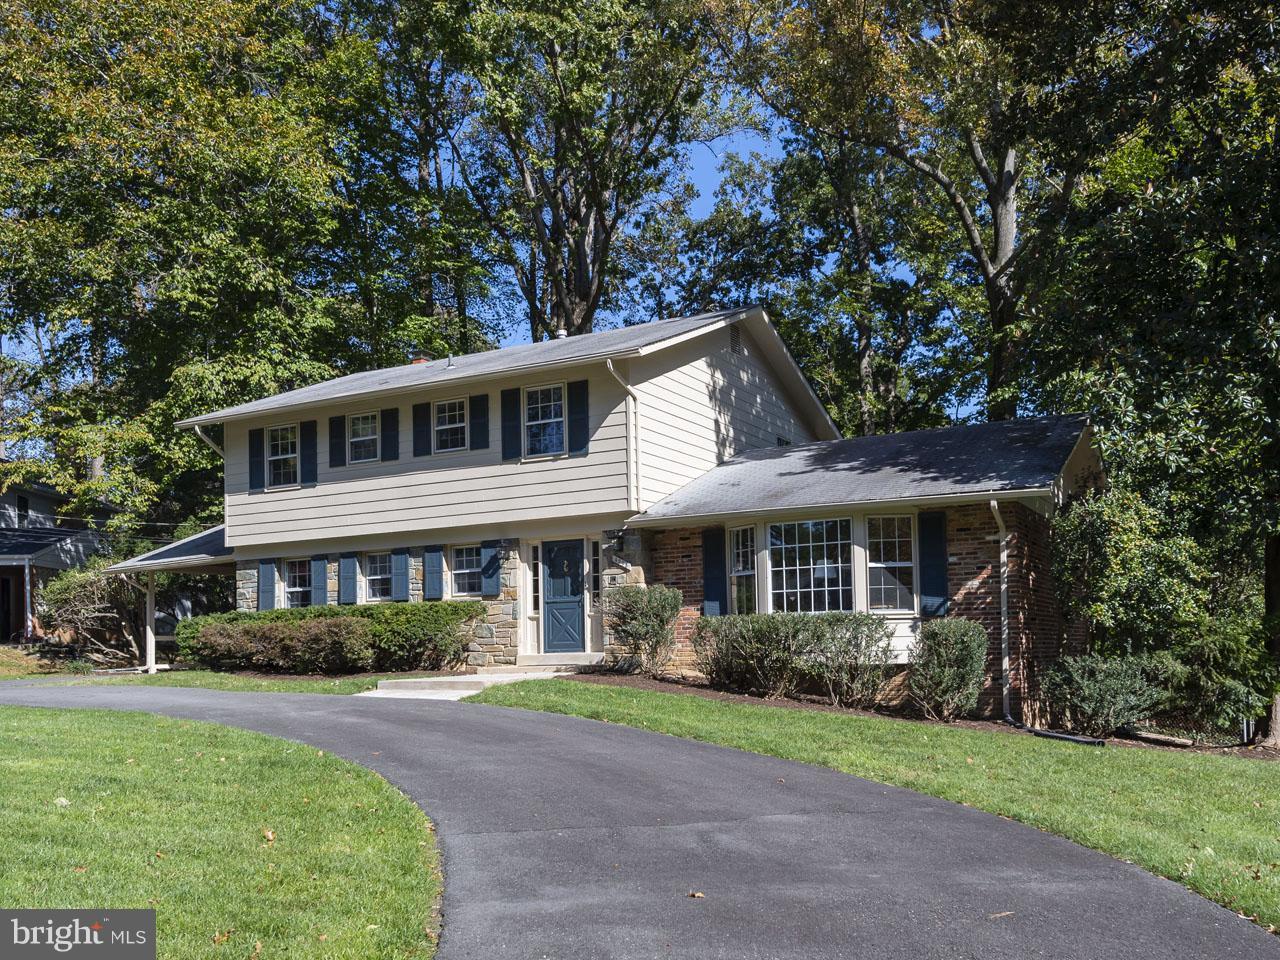 1010014728-300953034916-2021-09-05-13-50-25  |   | Annandale Delaware Real Estate For Sale | MLS# 1010014728  - Best of Northern Virginia